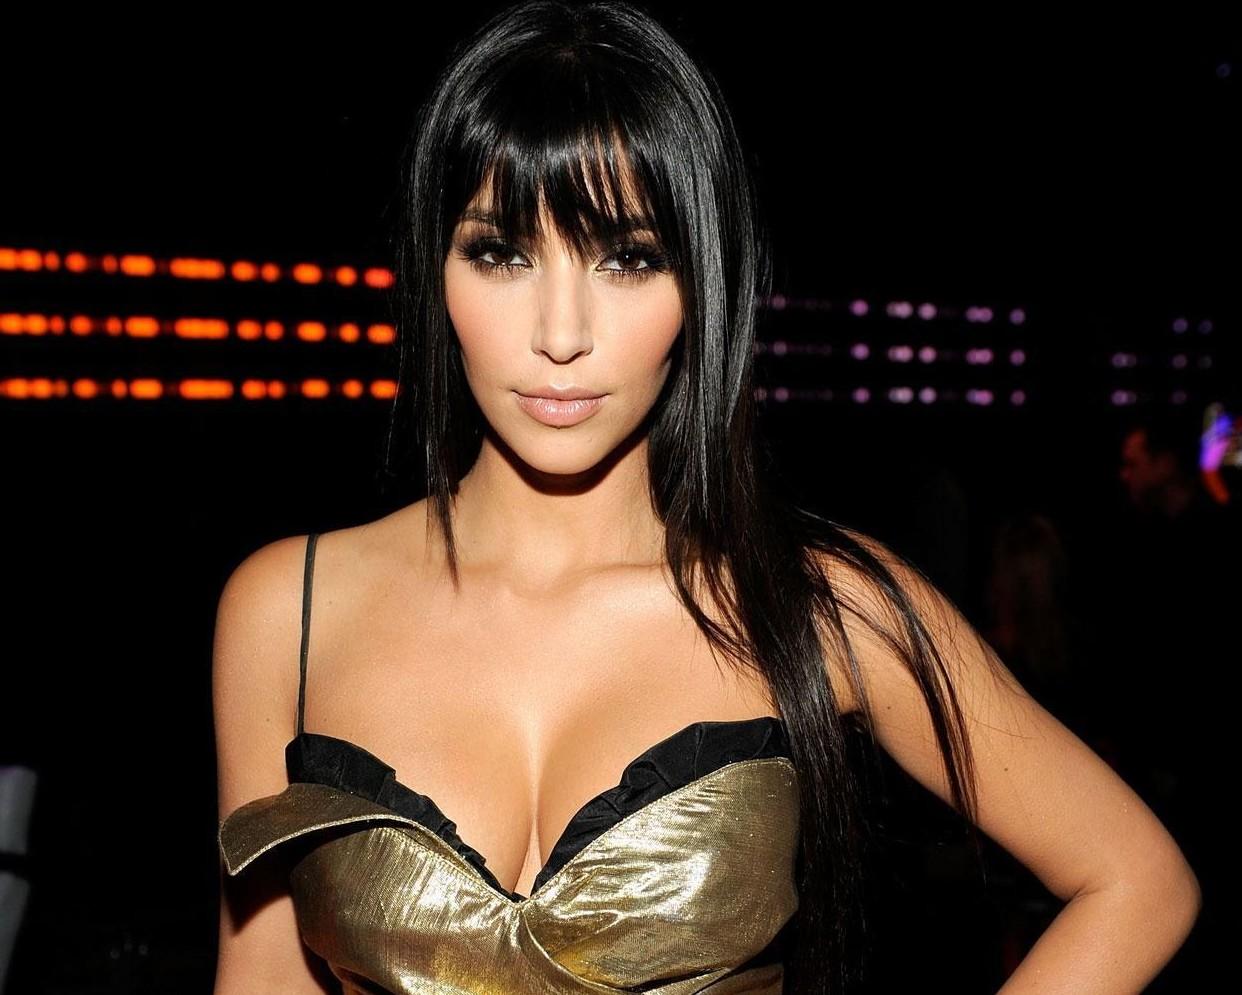 kim-kardashian-photoshoot-2012-